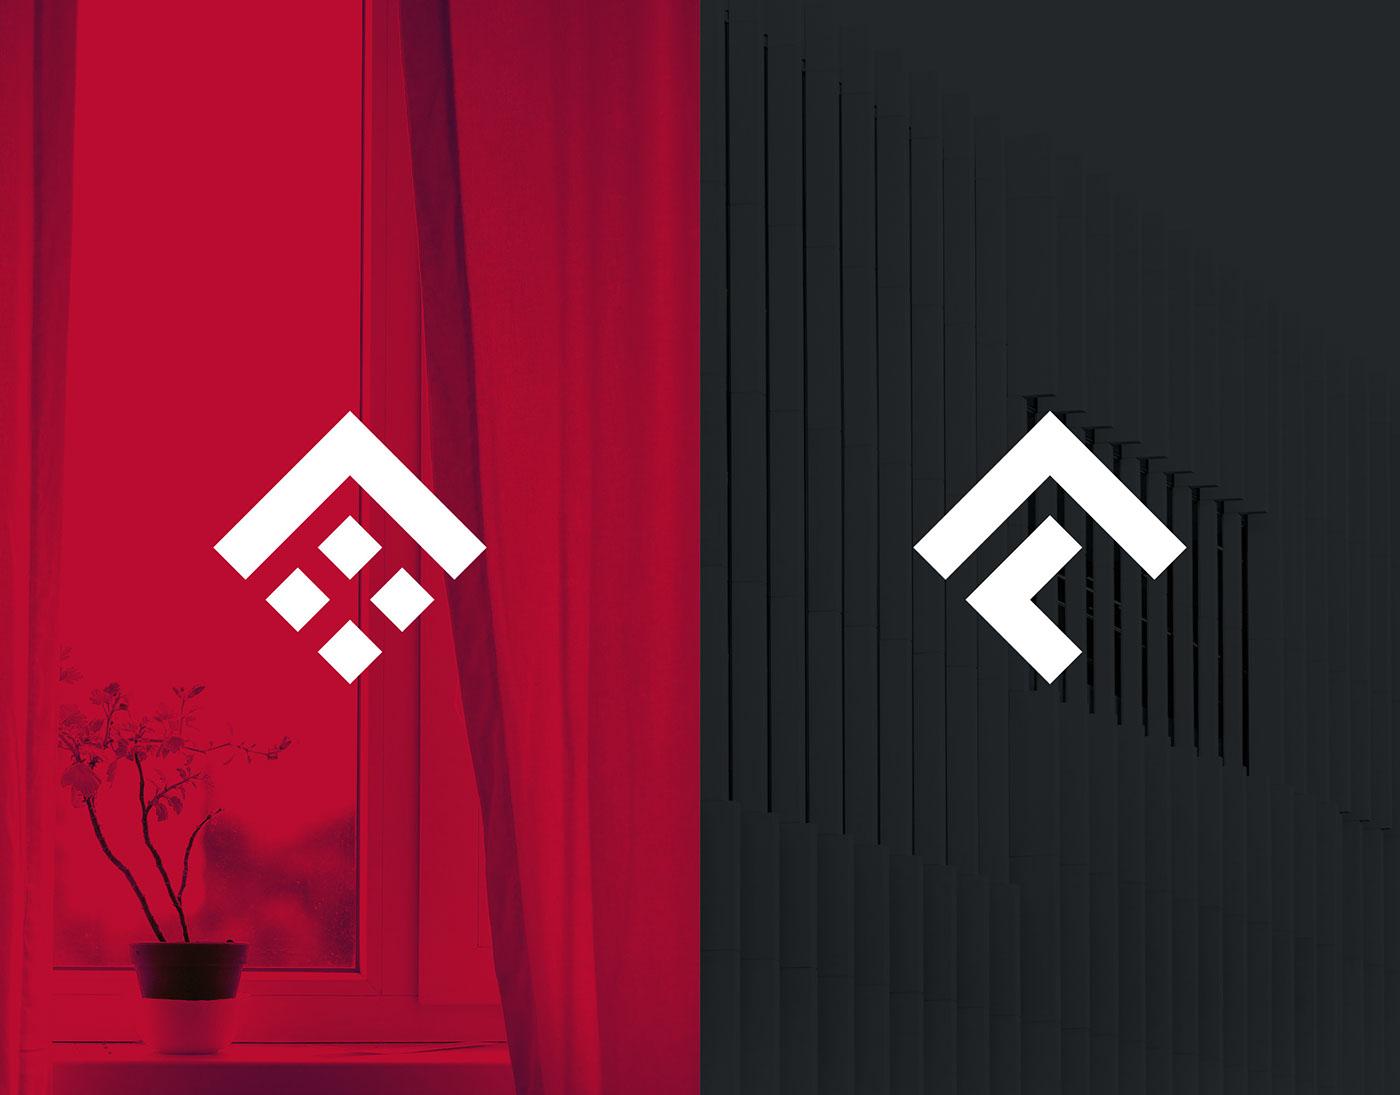 branding  logo design Golden Ratio logofolio sub-brands rebranding brand identity visual identity guideline